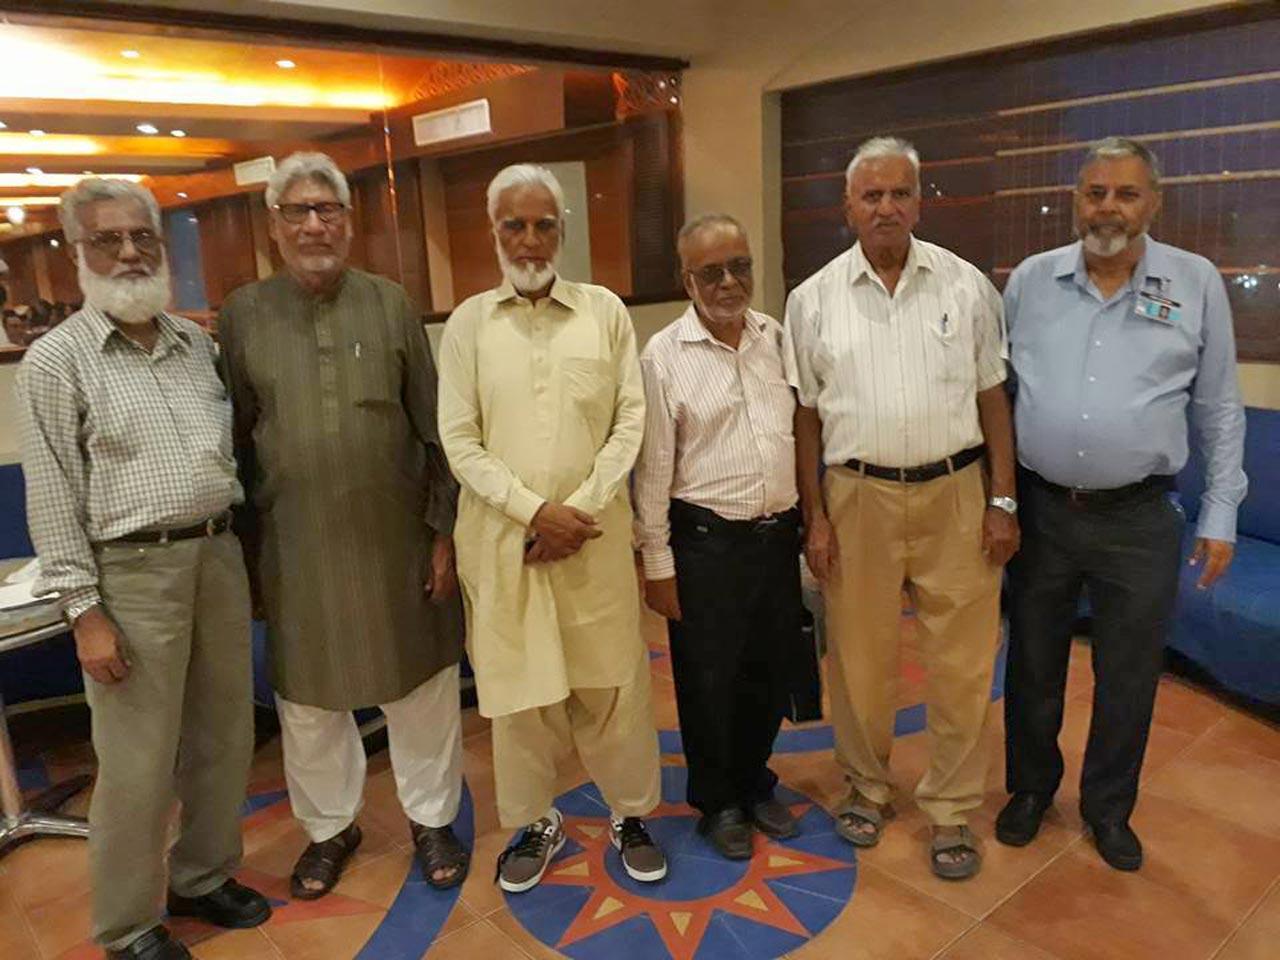 Jamiluddin Shaikh, Muhammad Salim Hamid, Kamal A. Farooqi, Qutubuddin Khan, Arif Qamar